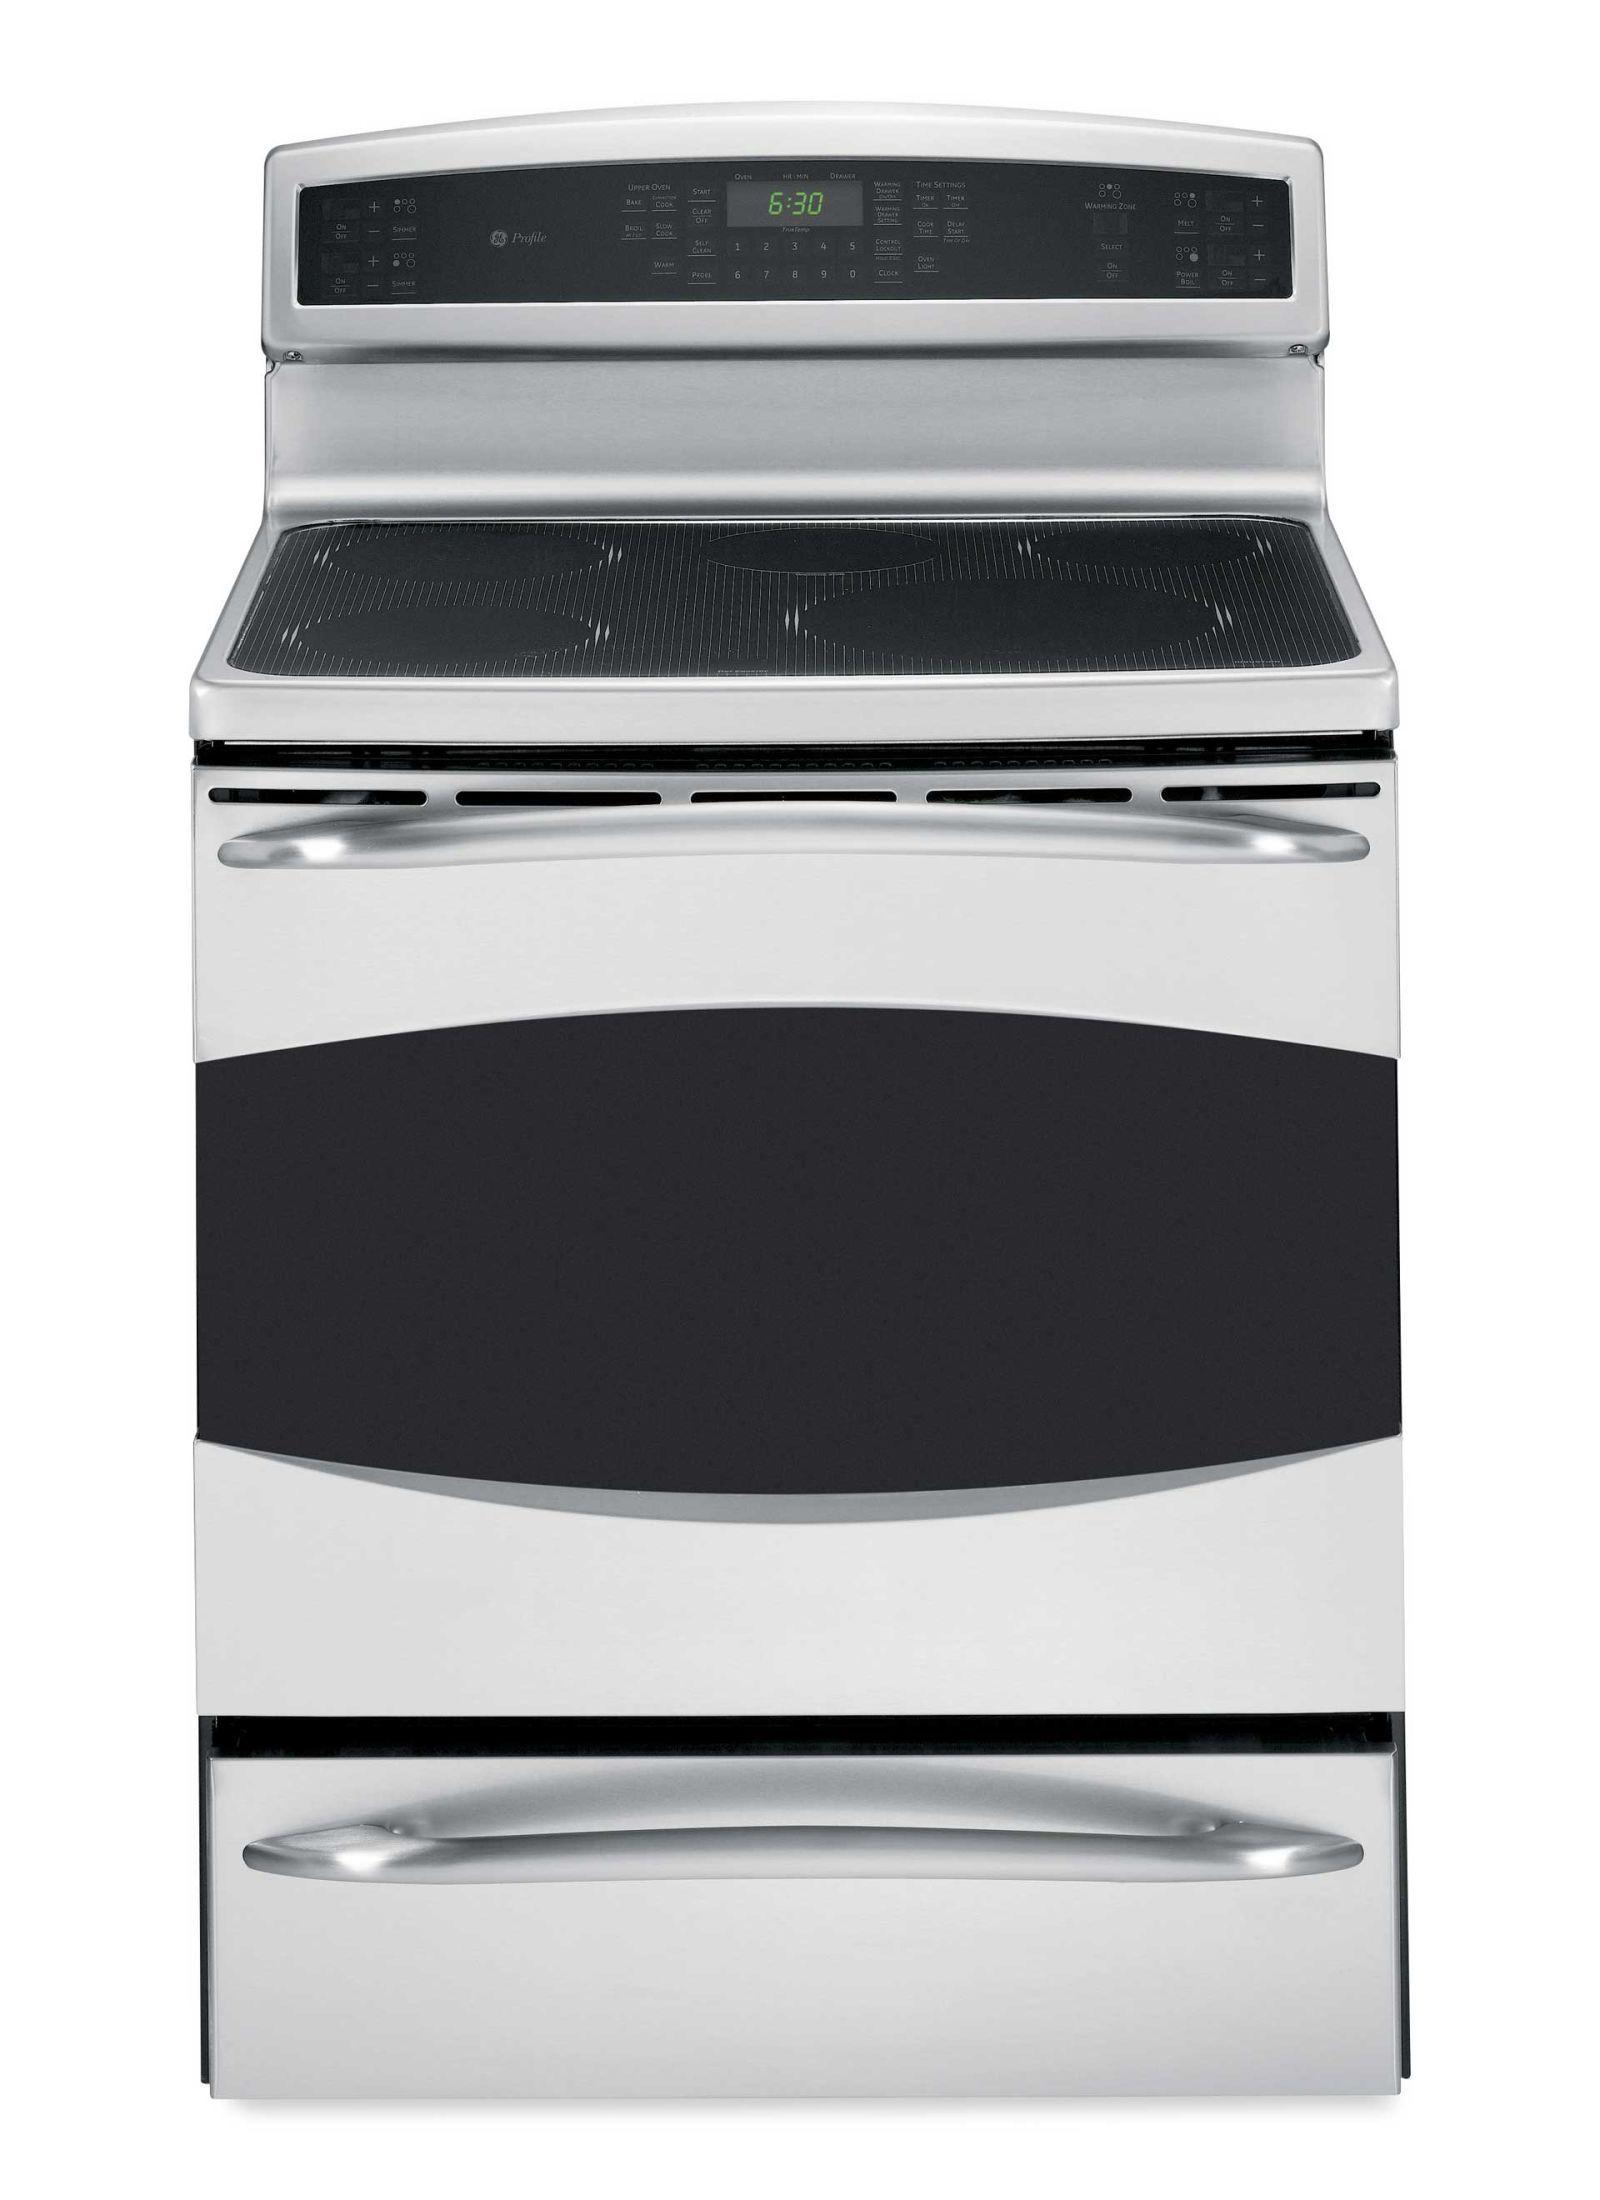 Ge Profile Phb9255p3ss Induction Range Induction Range Cooking